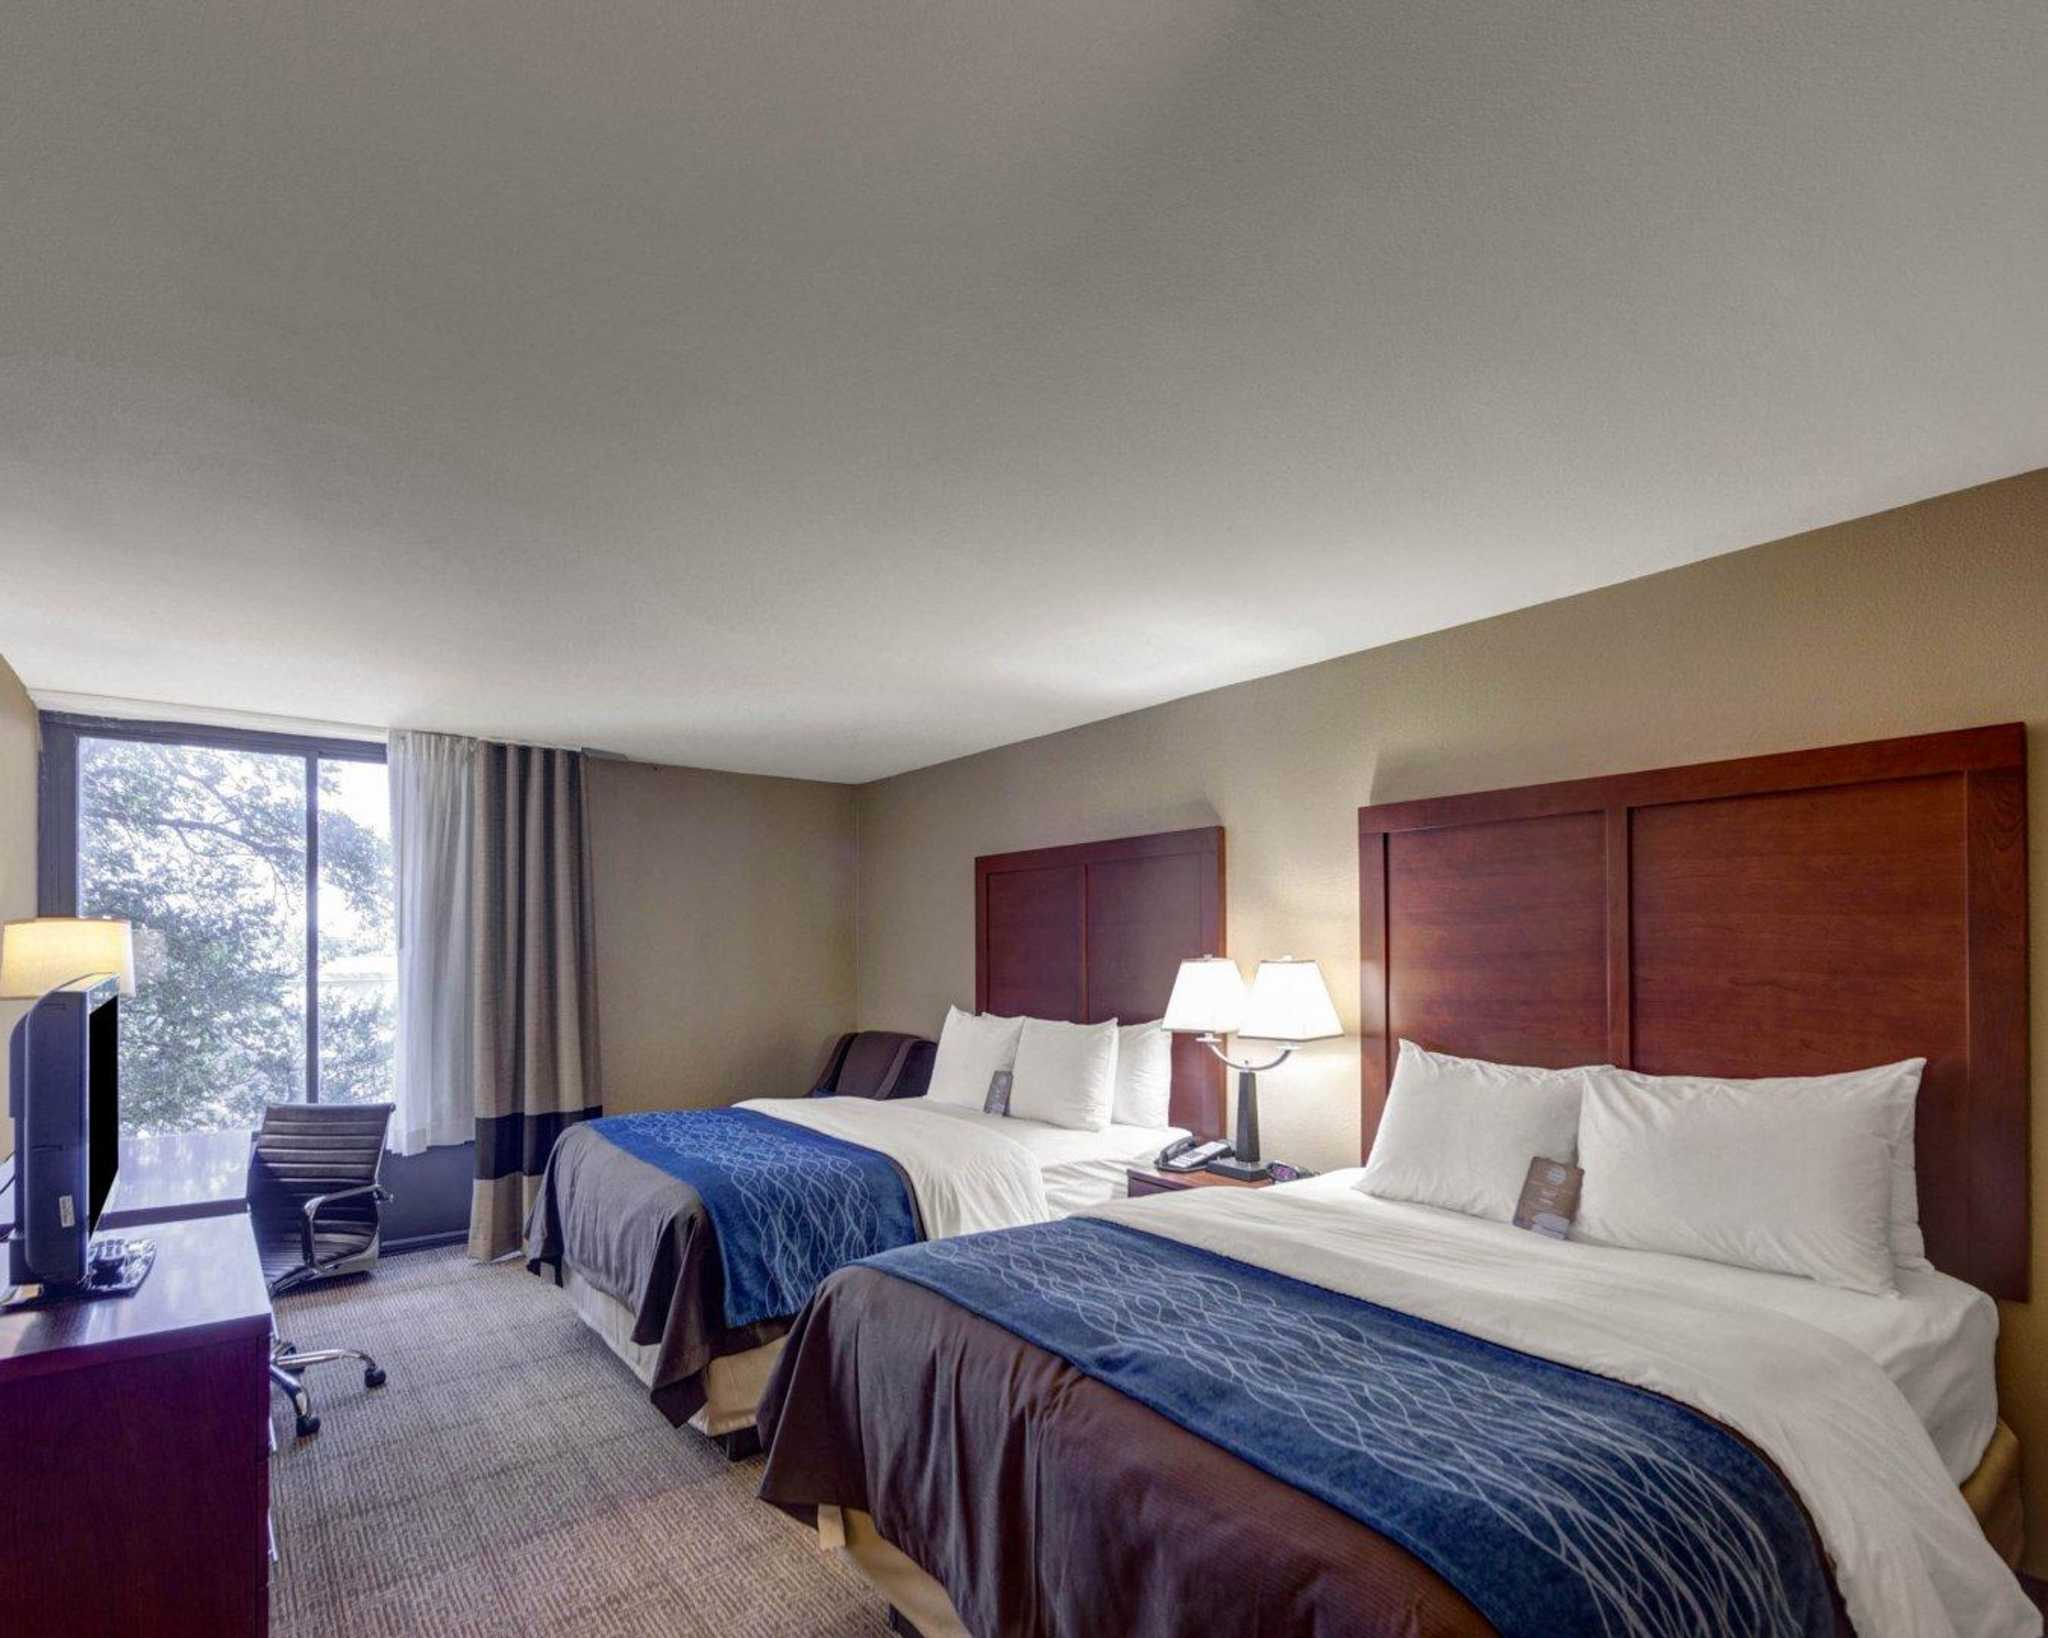 Comfort Inn & Suites Plano East image 44